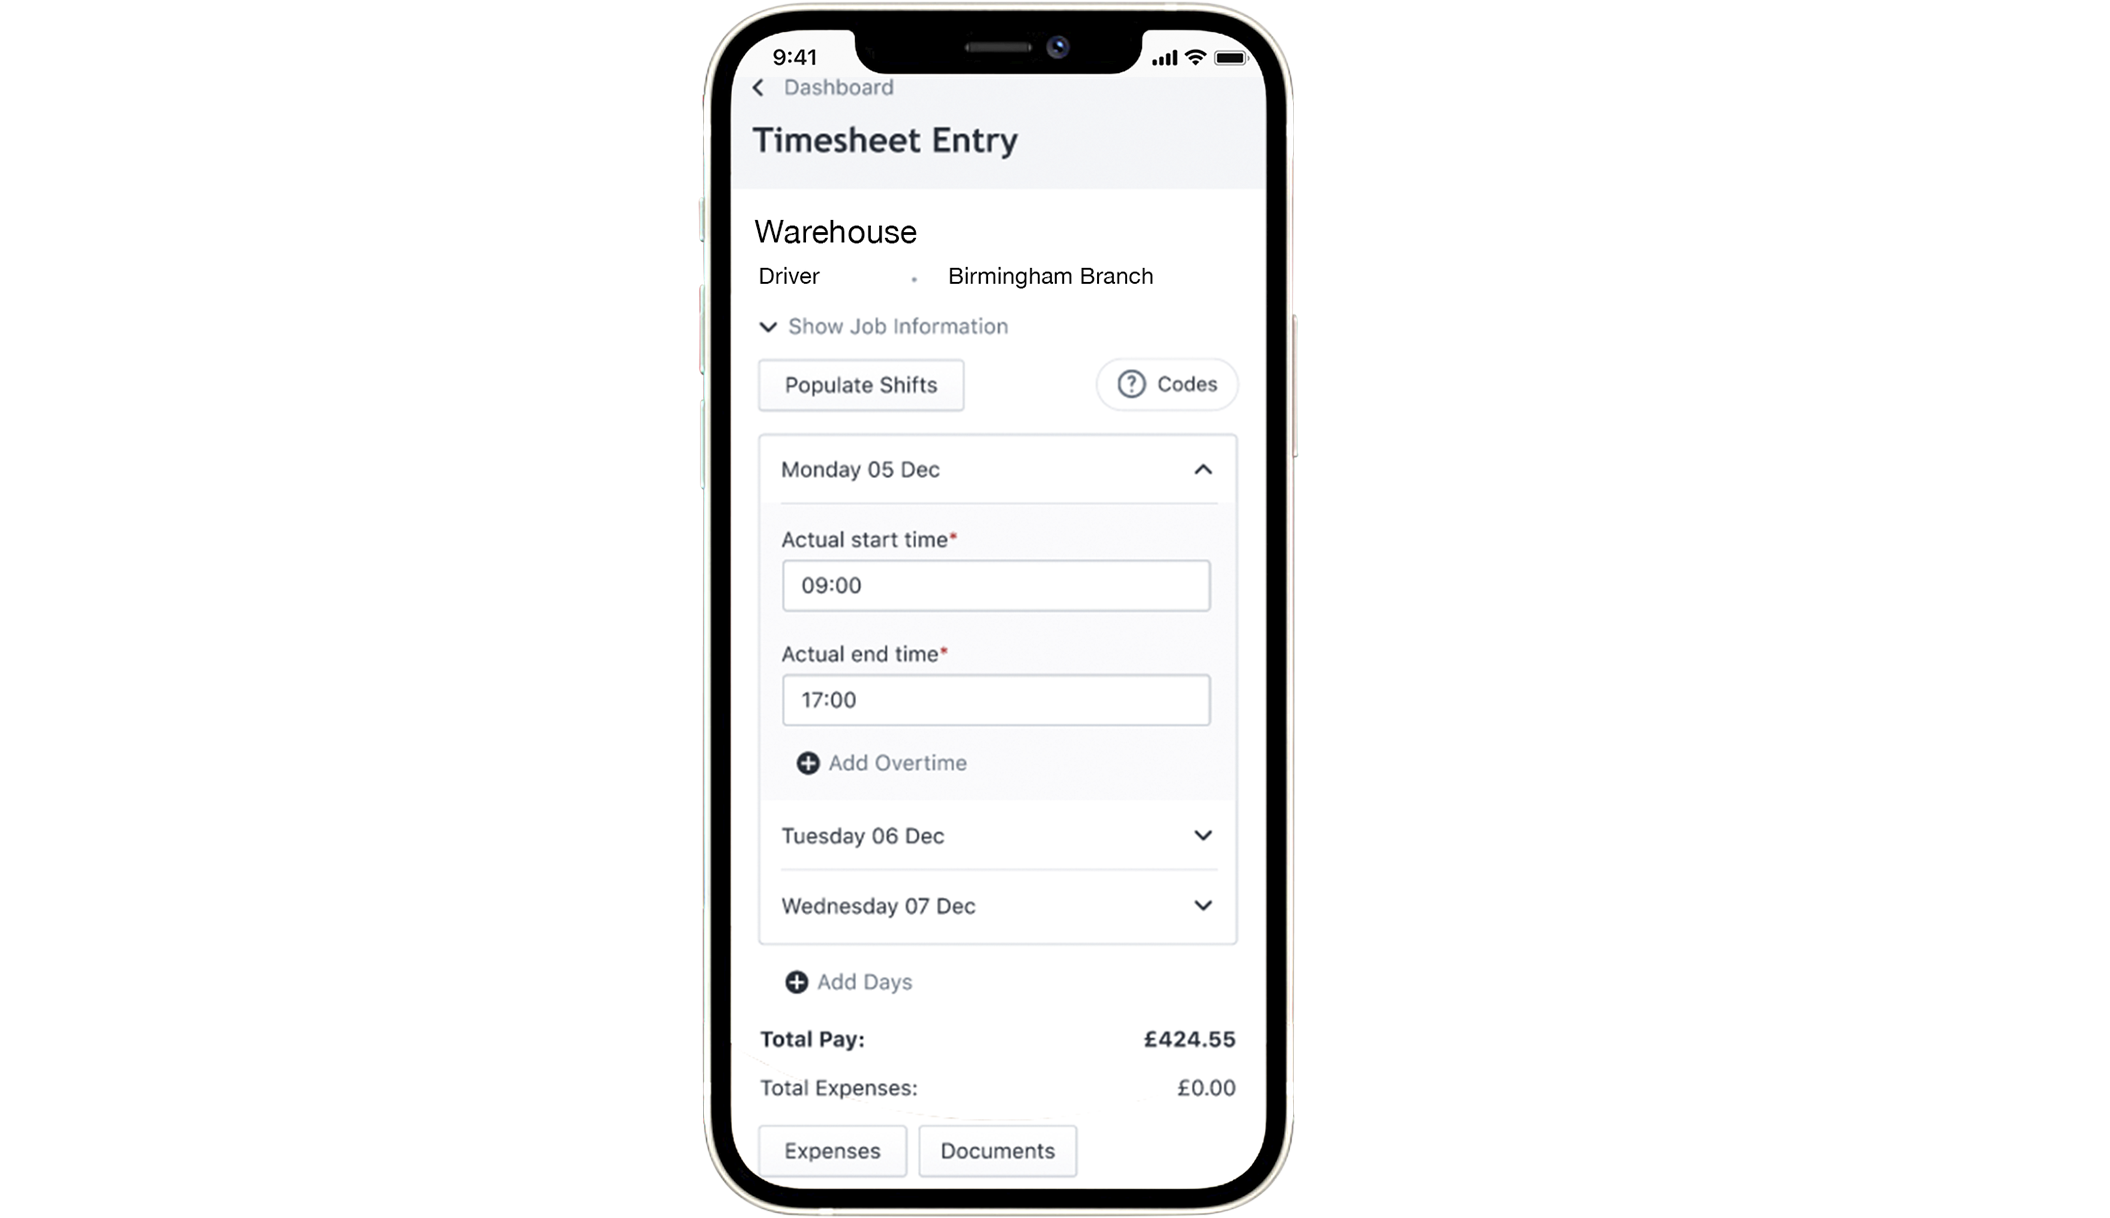 Warehouse VMS dashboard on mobile